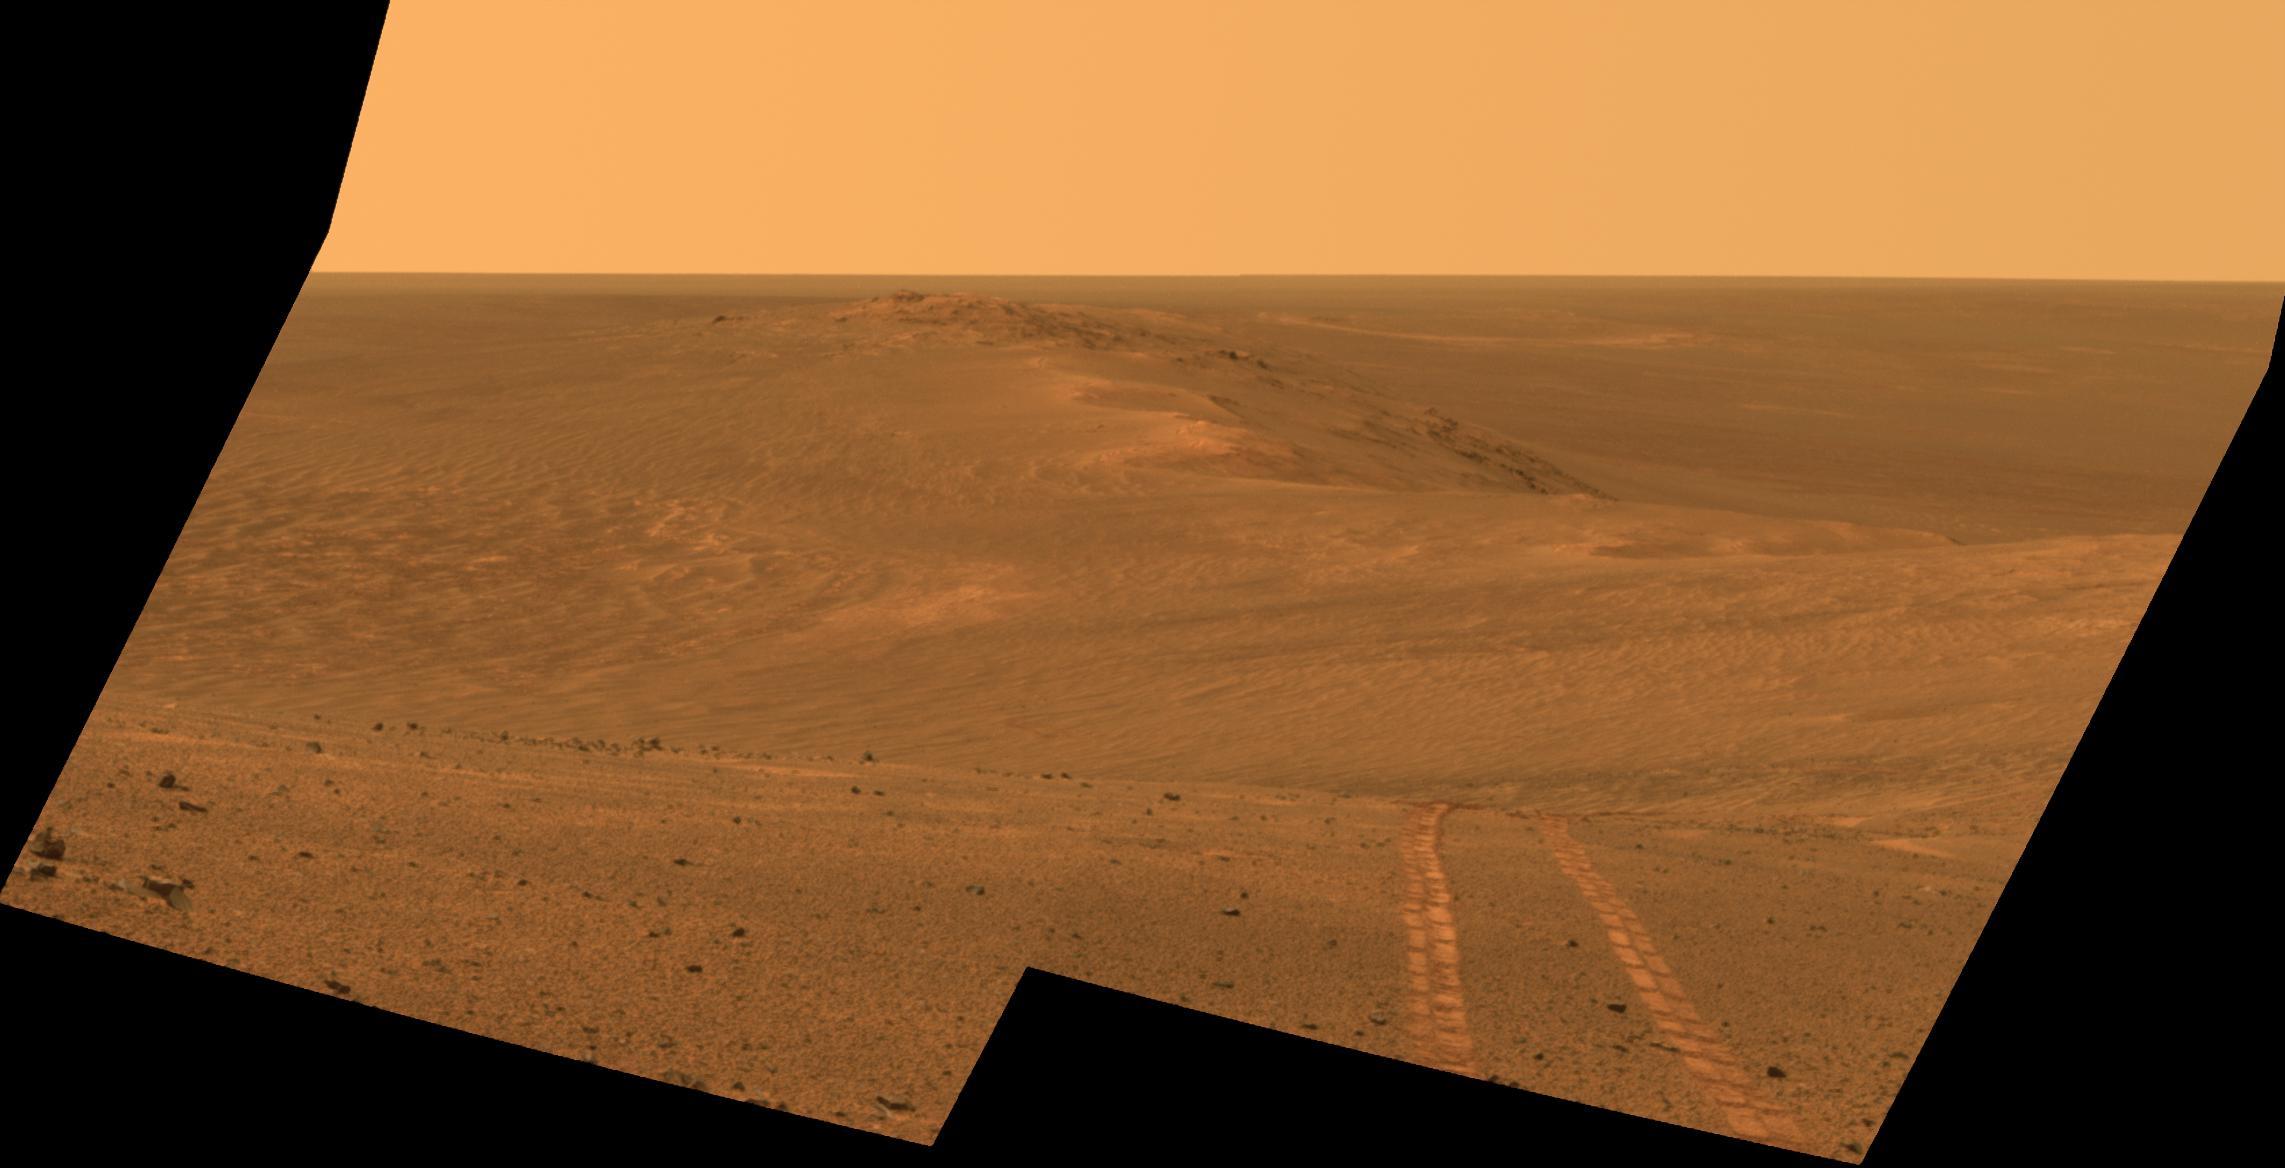 mars rover exploration facts - photo #22